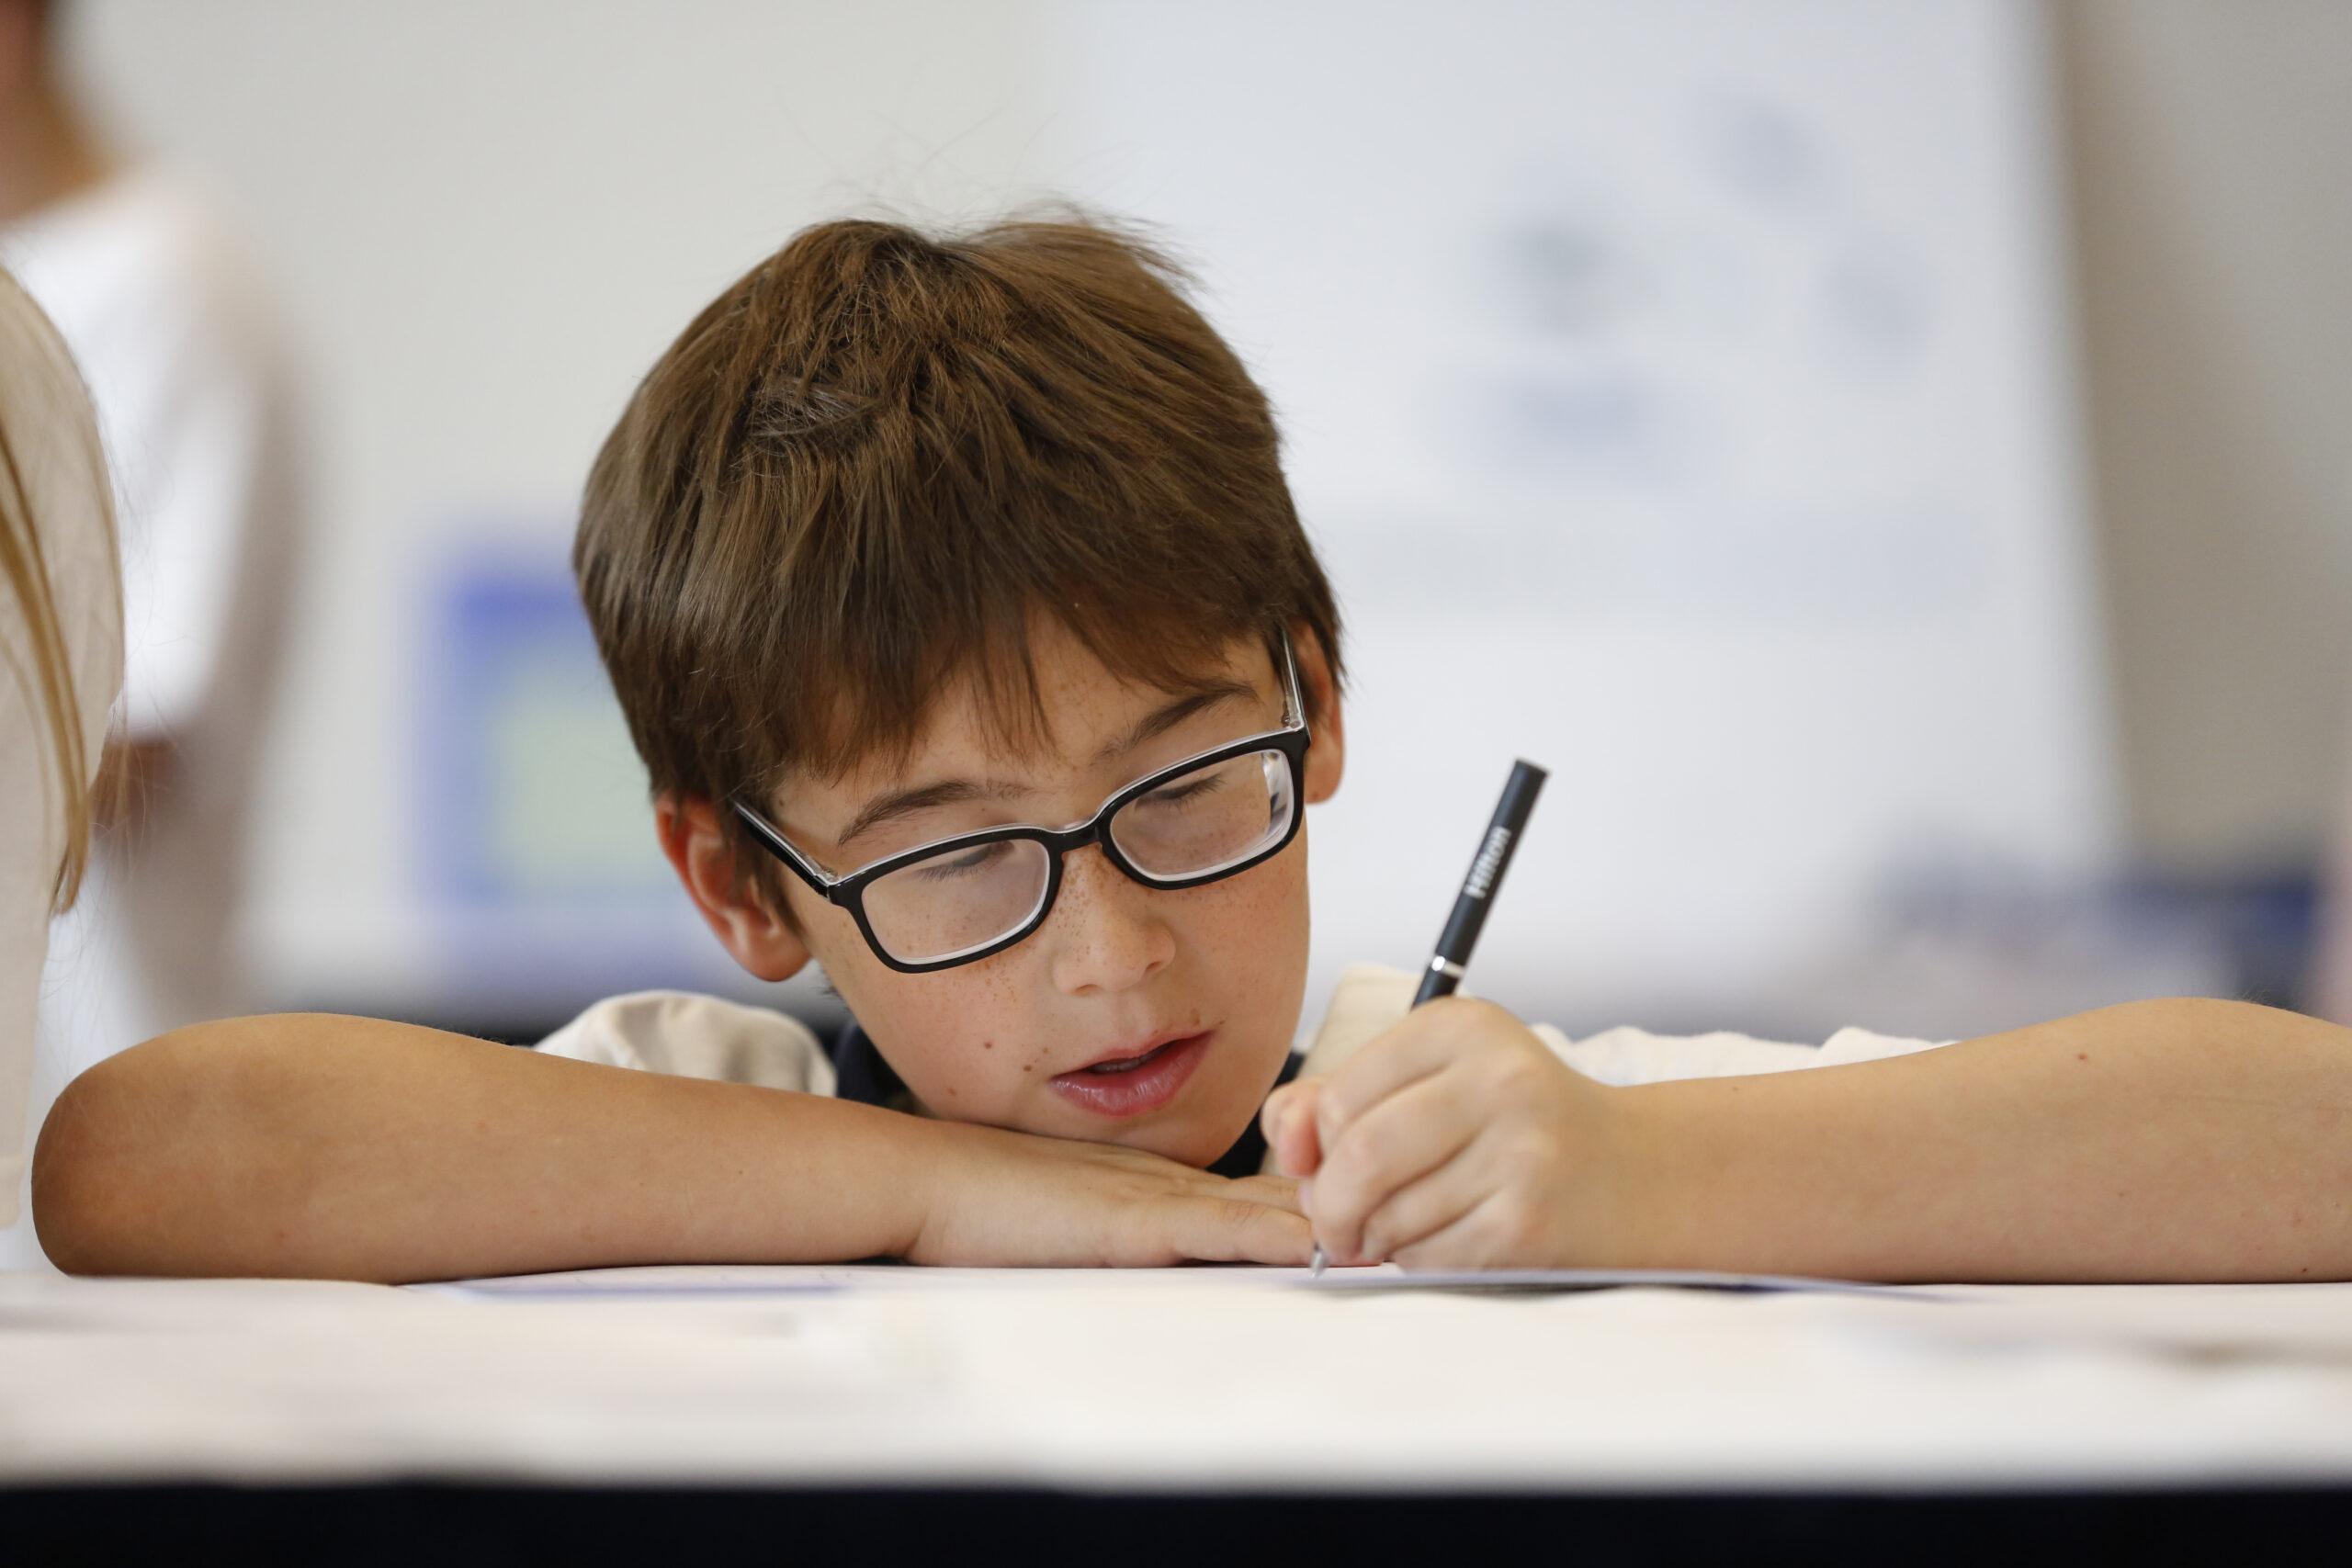 A boy writing, wearing glasses